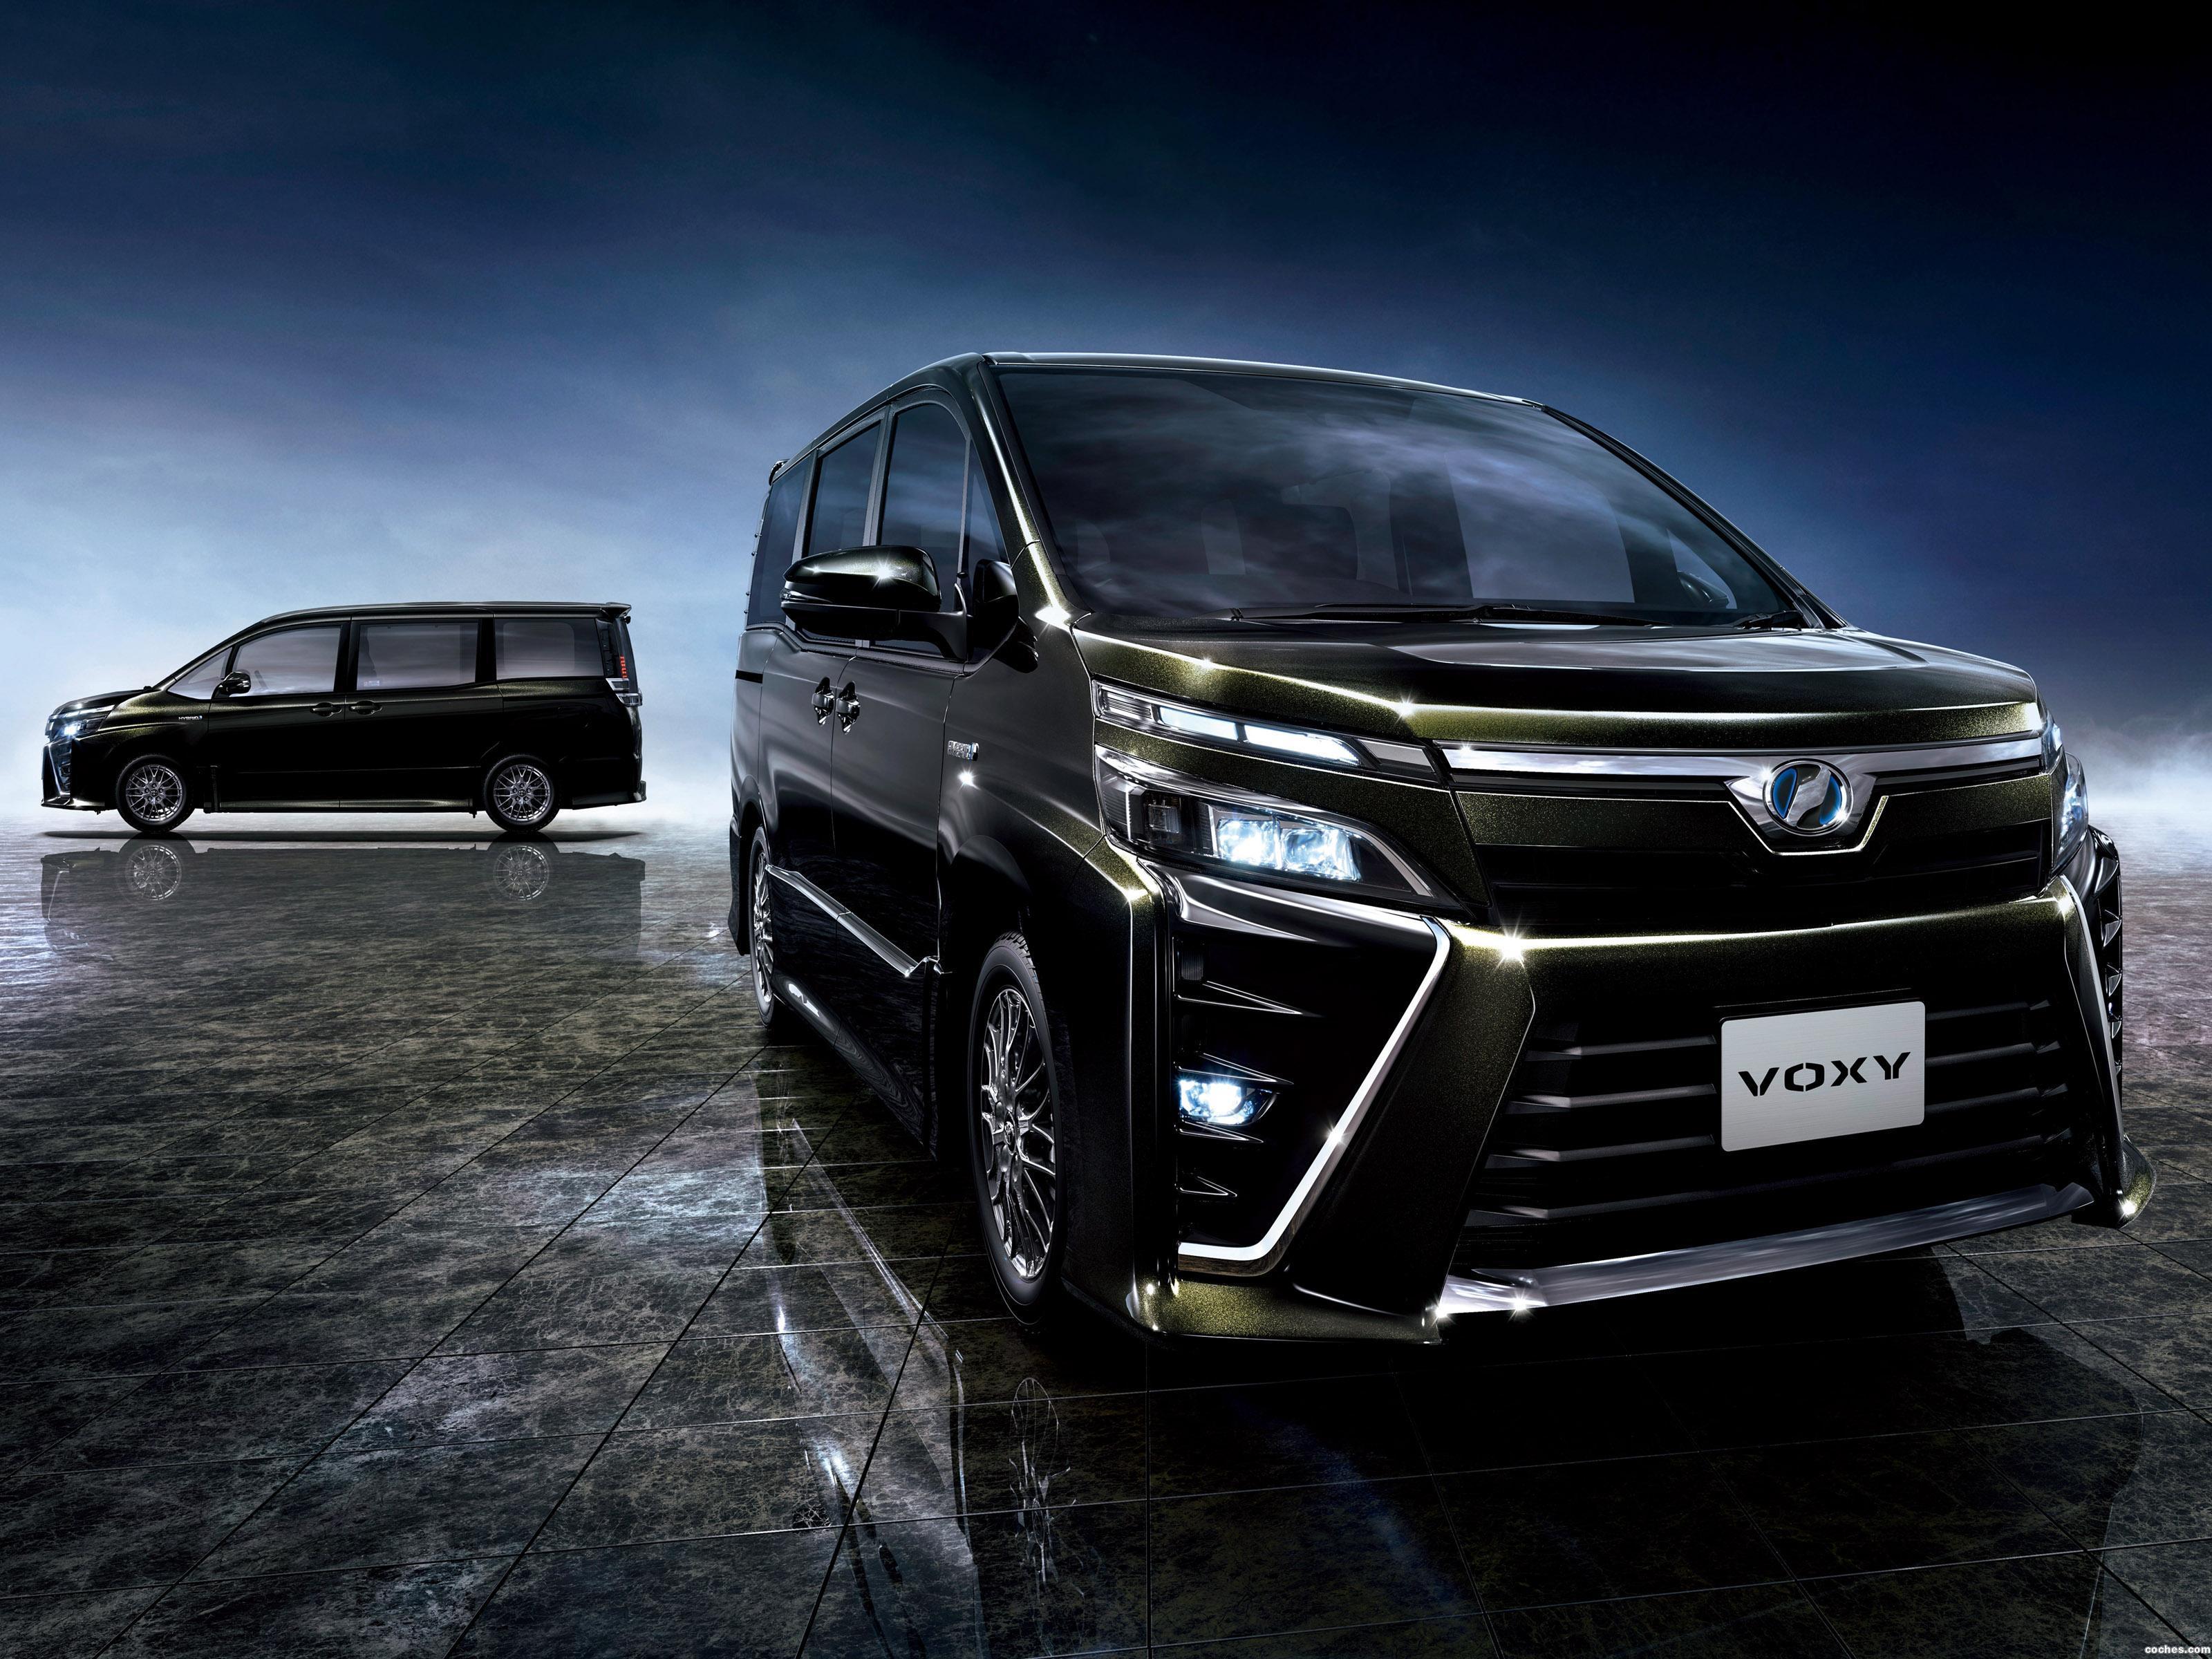 Foto 1 de Toyota Voxy ZS Hybrid 2017